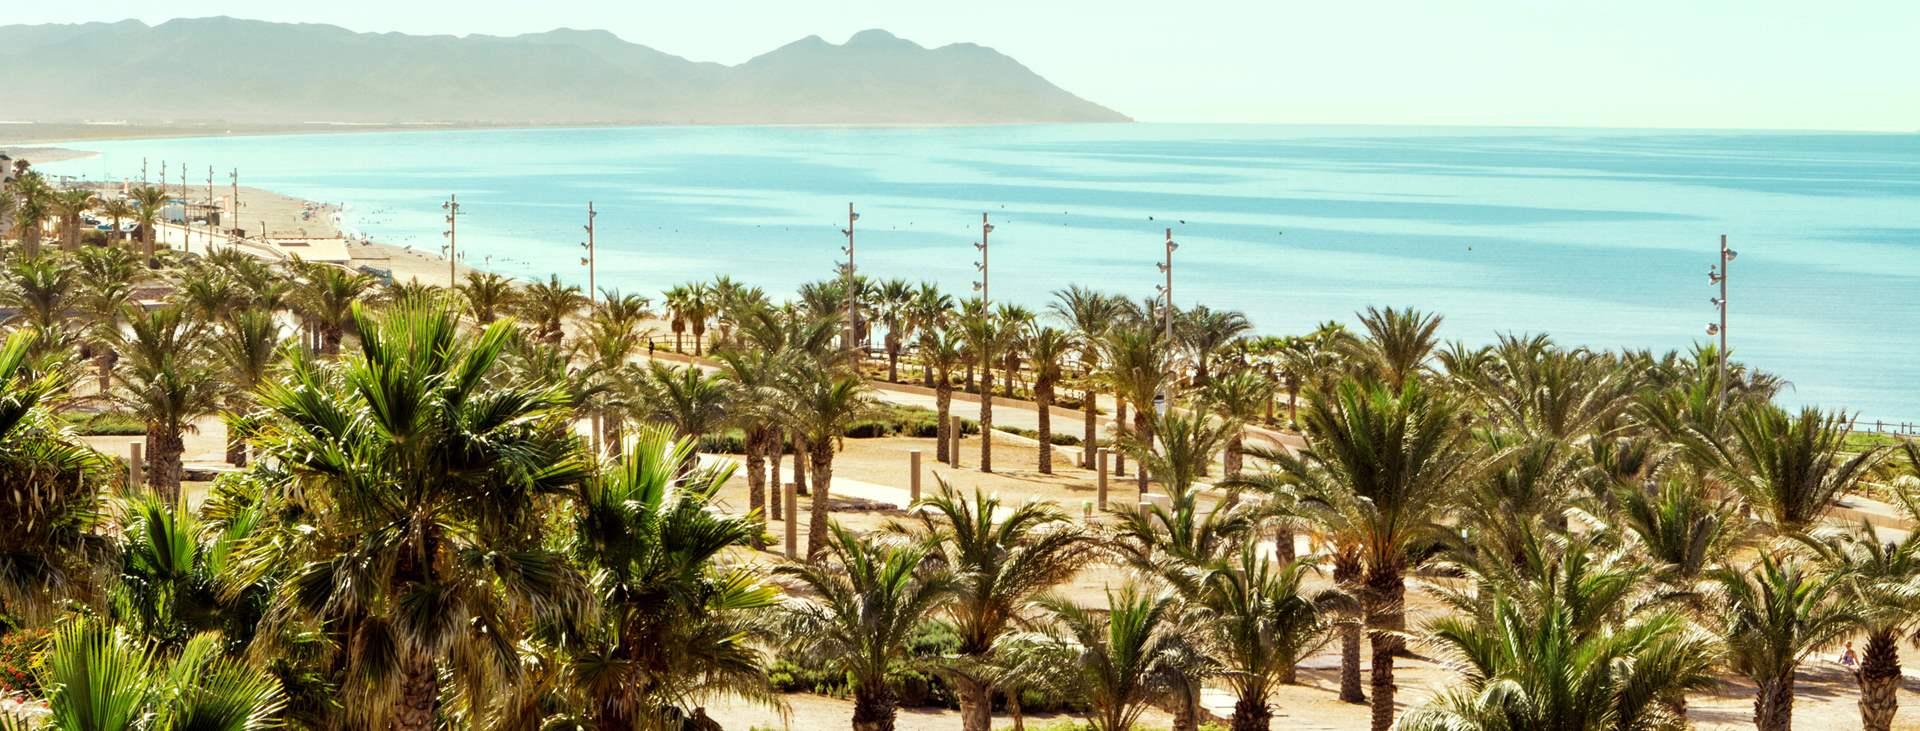 Boka en resa med All Inclusive till El Toyo i Spanien